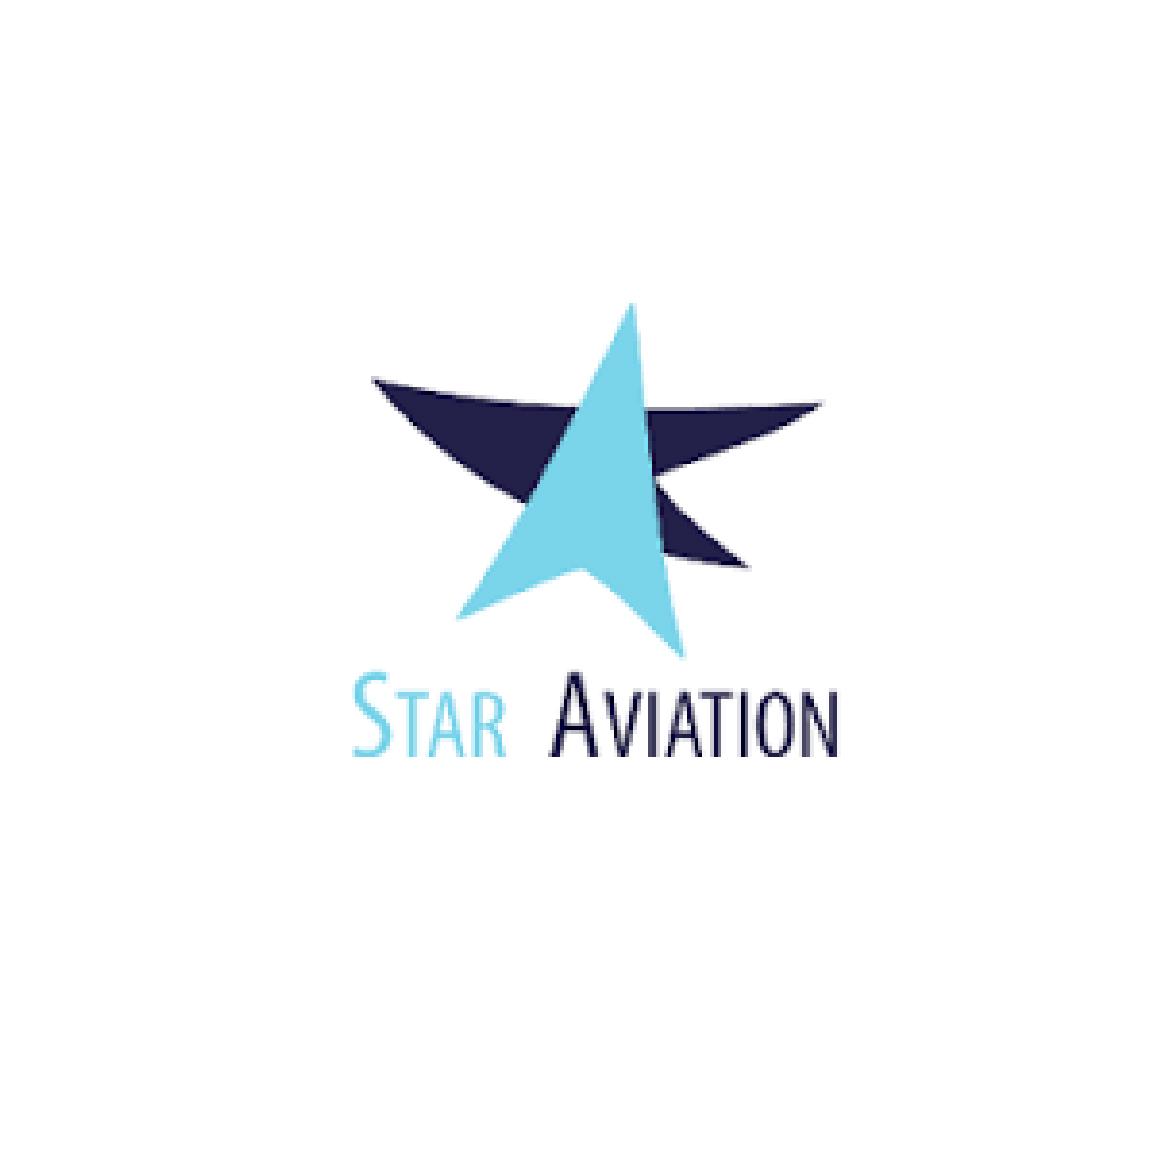 Star Aviation